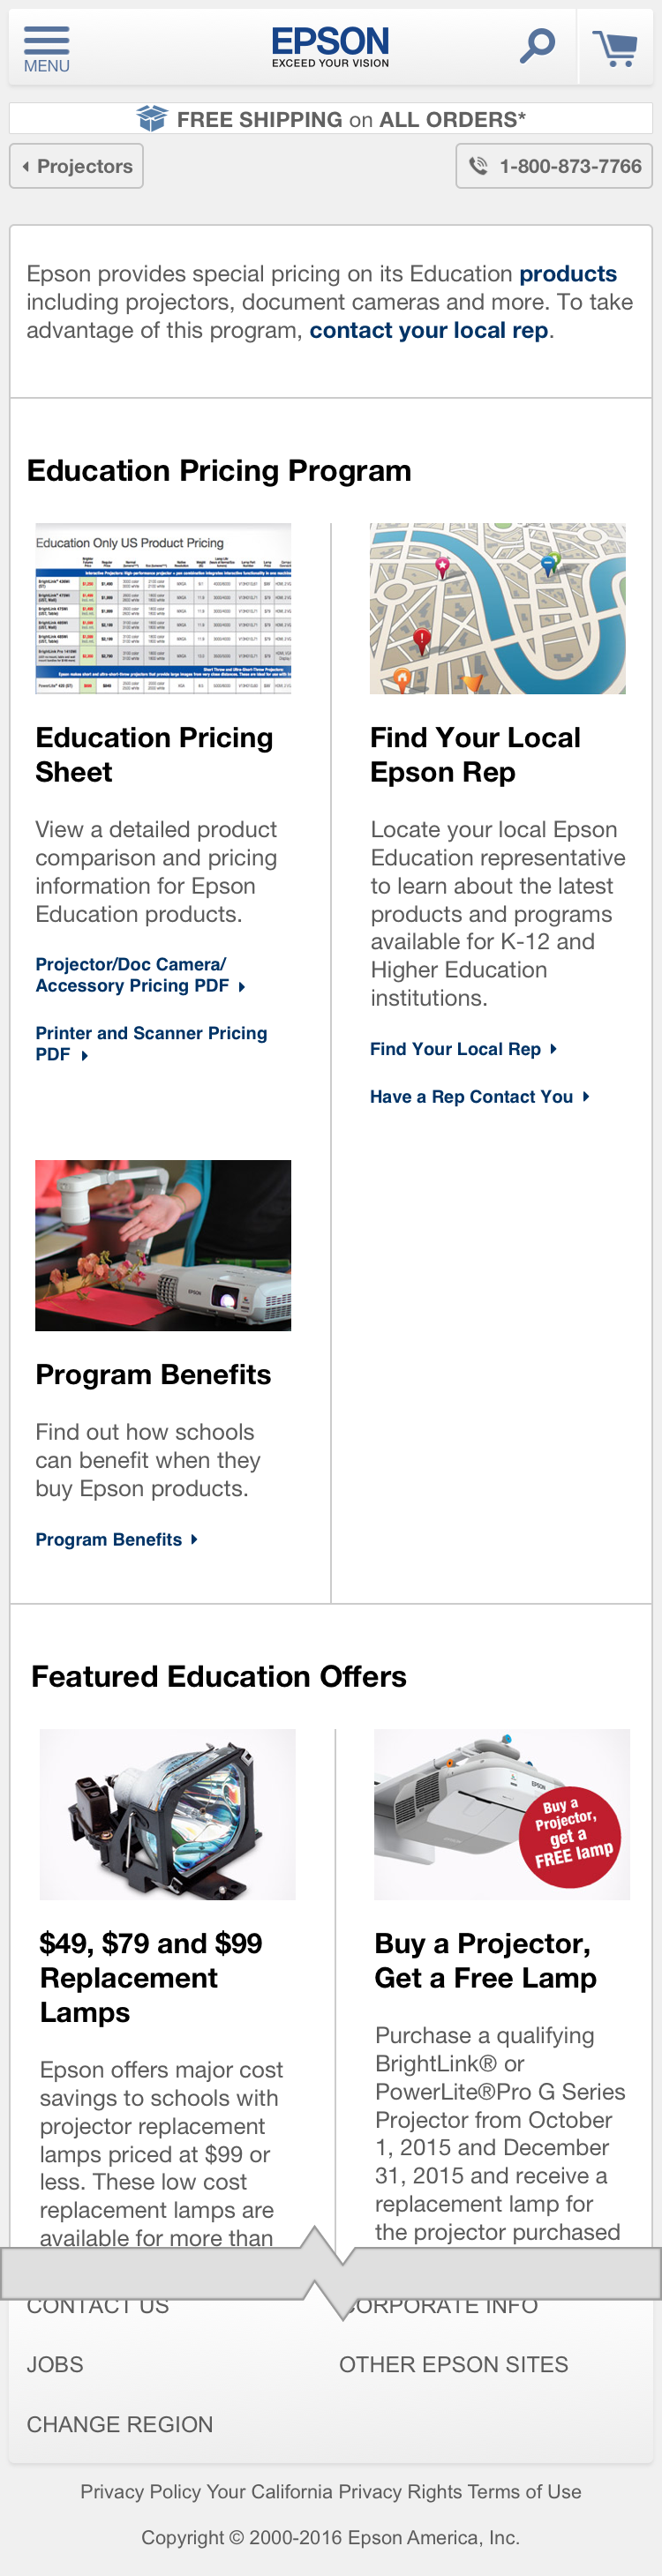 Education Projectors - Education Pricing Program